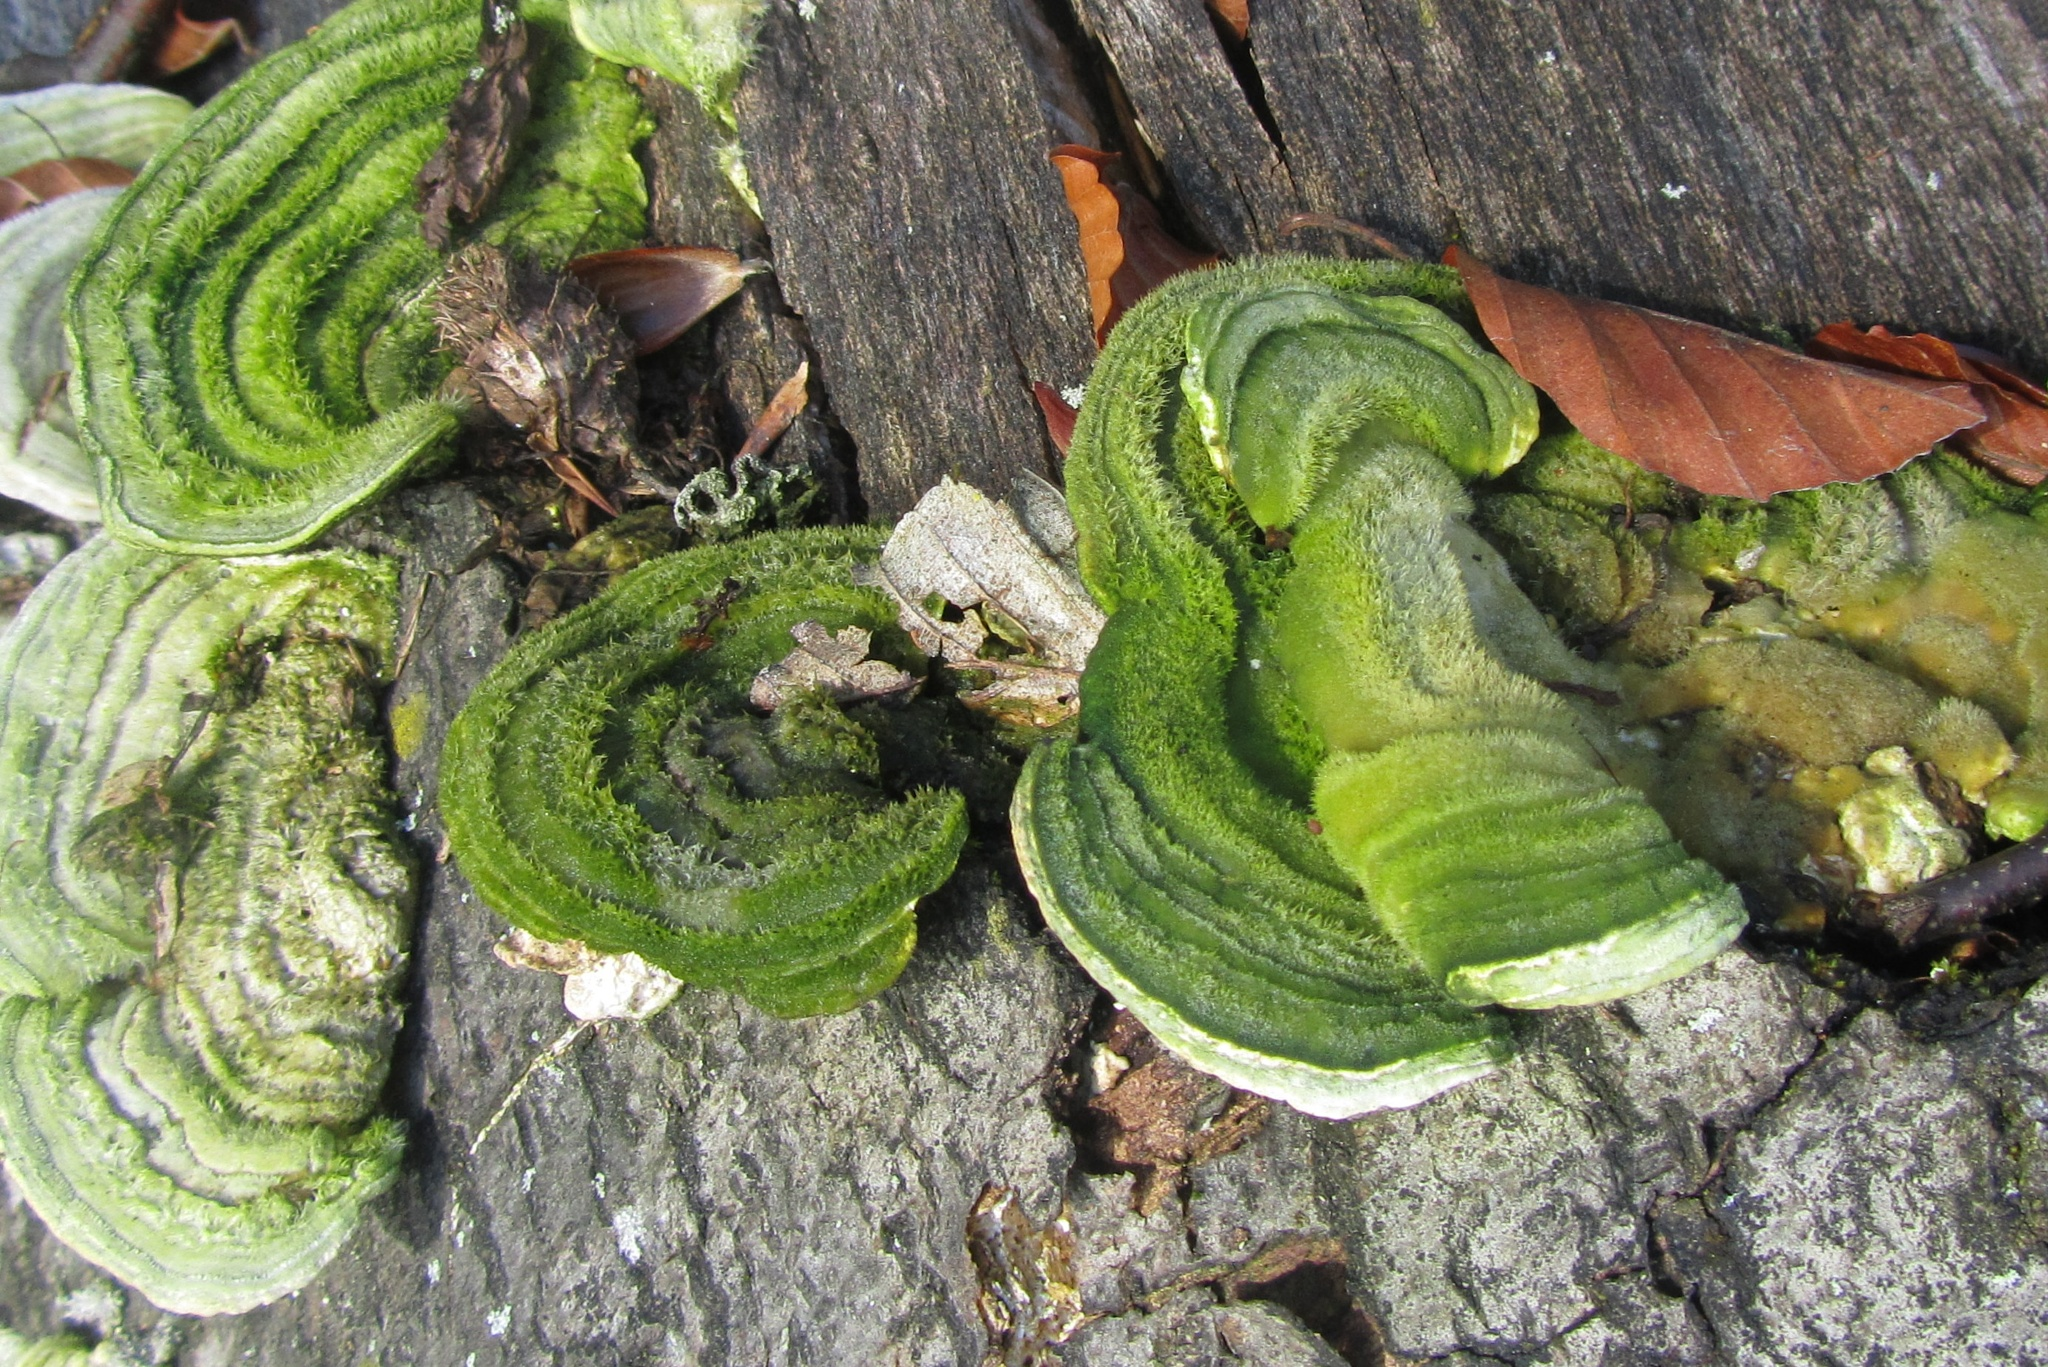 Fungus by AnnDessnert